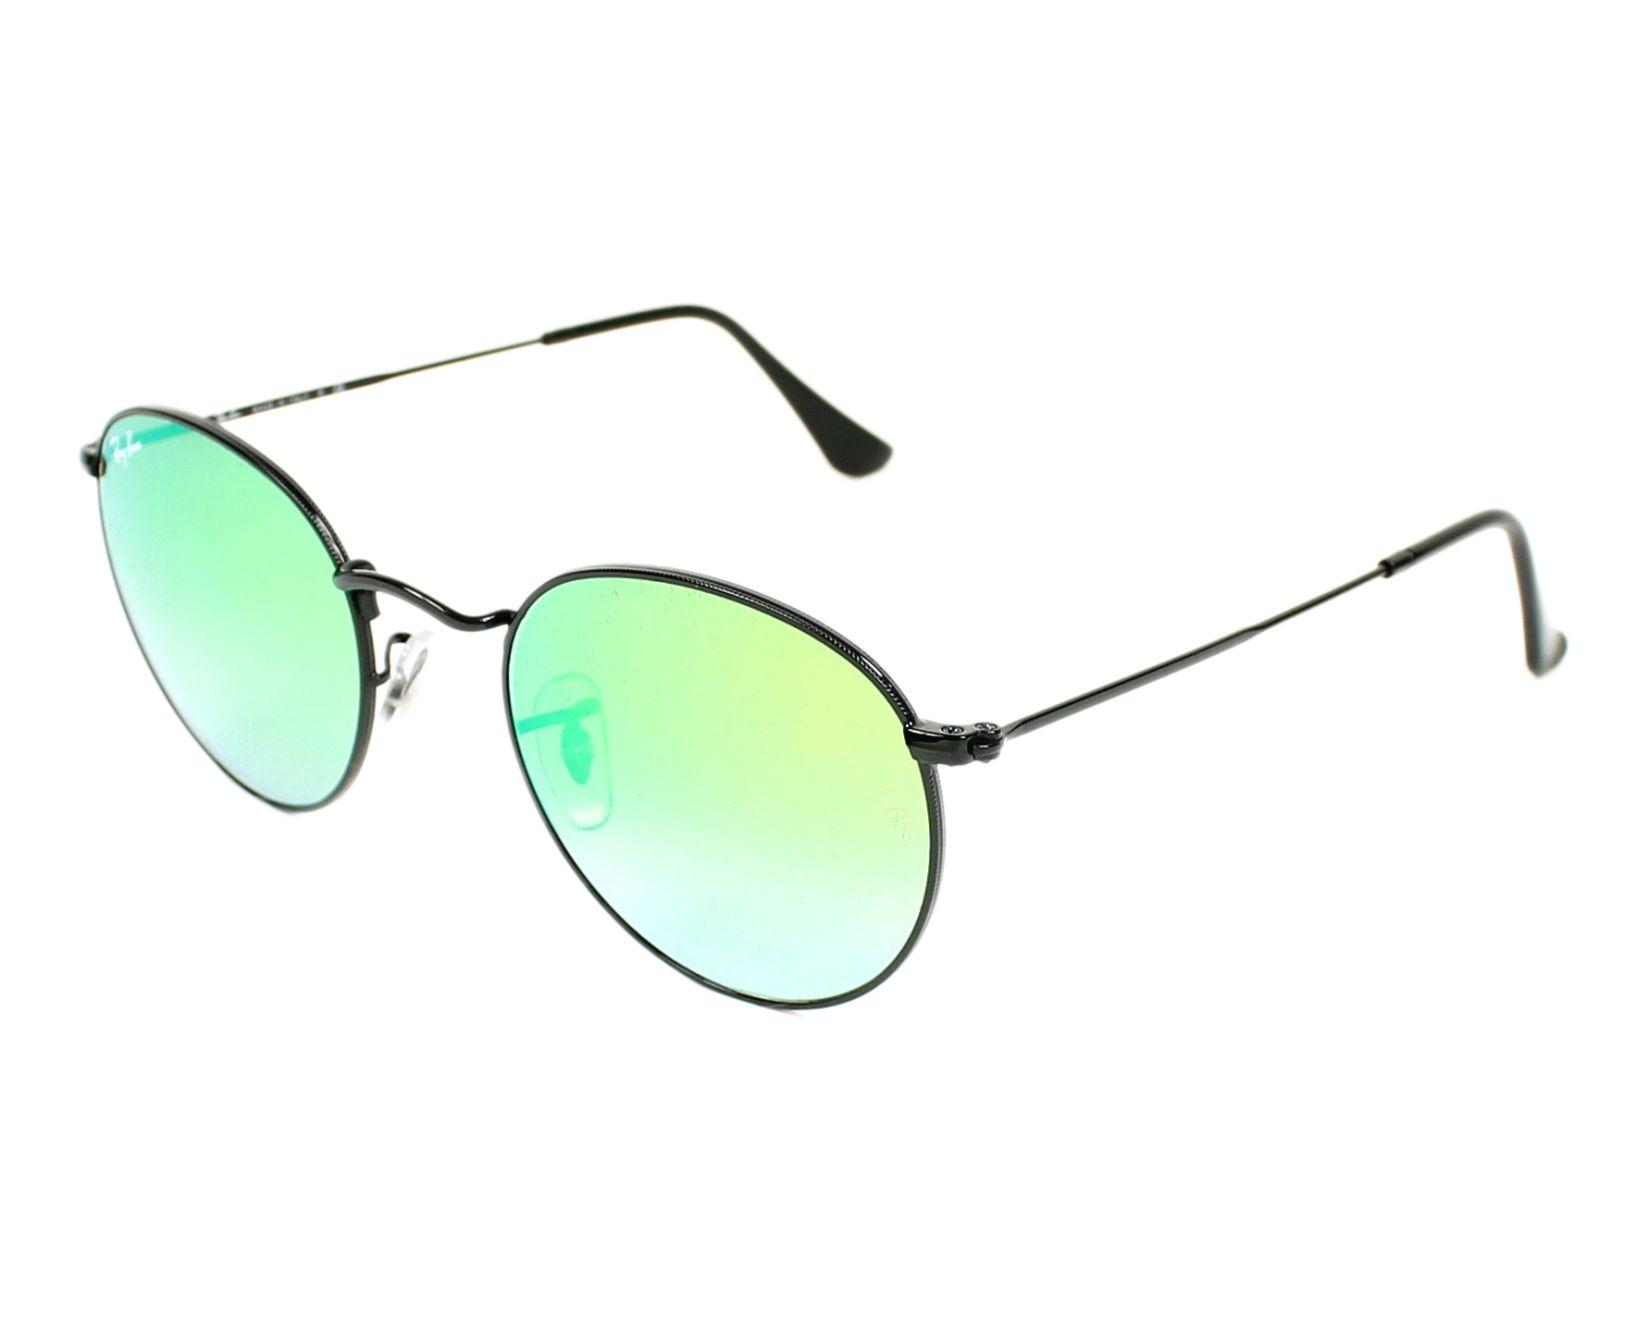 388bb5927e Sunglasses Ray-Ban RB-3447 002 4J 50-21 Black profile view